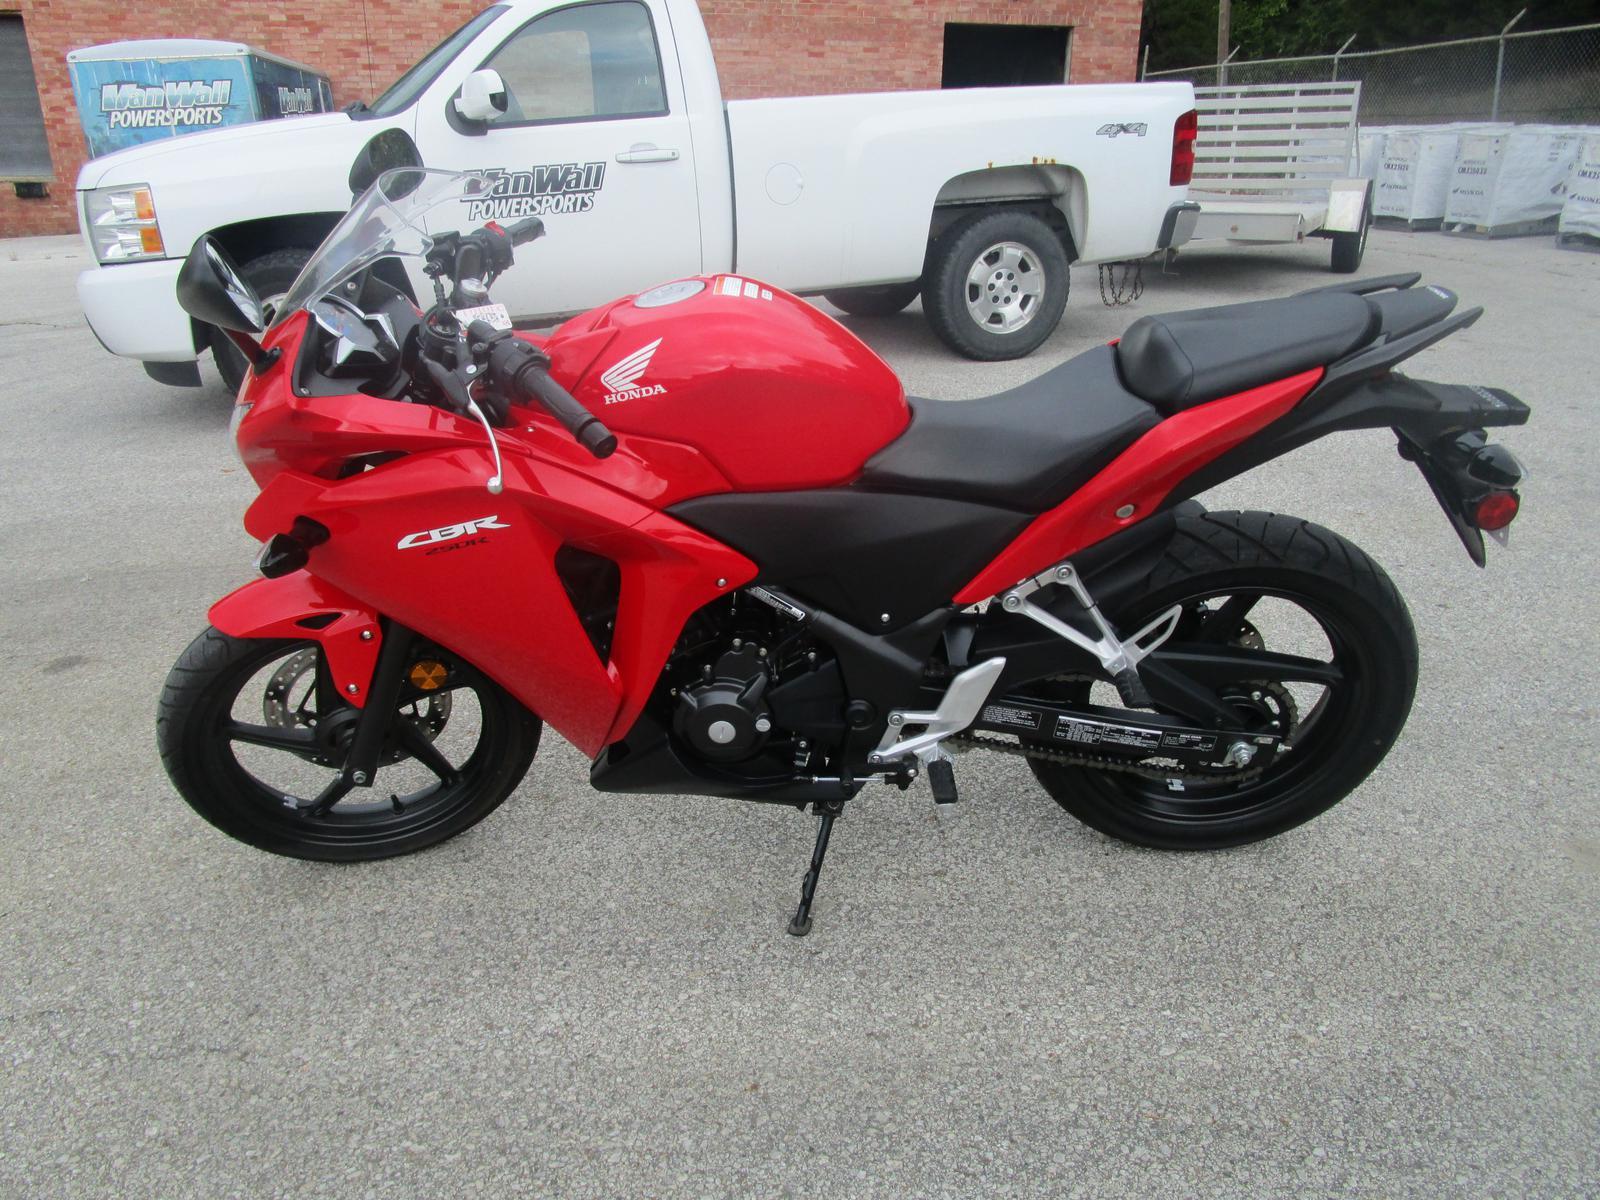 2013 Honda CBR250R For Sale In Des Moines, IA | Garvis Honda (515) 243 6943